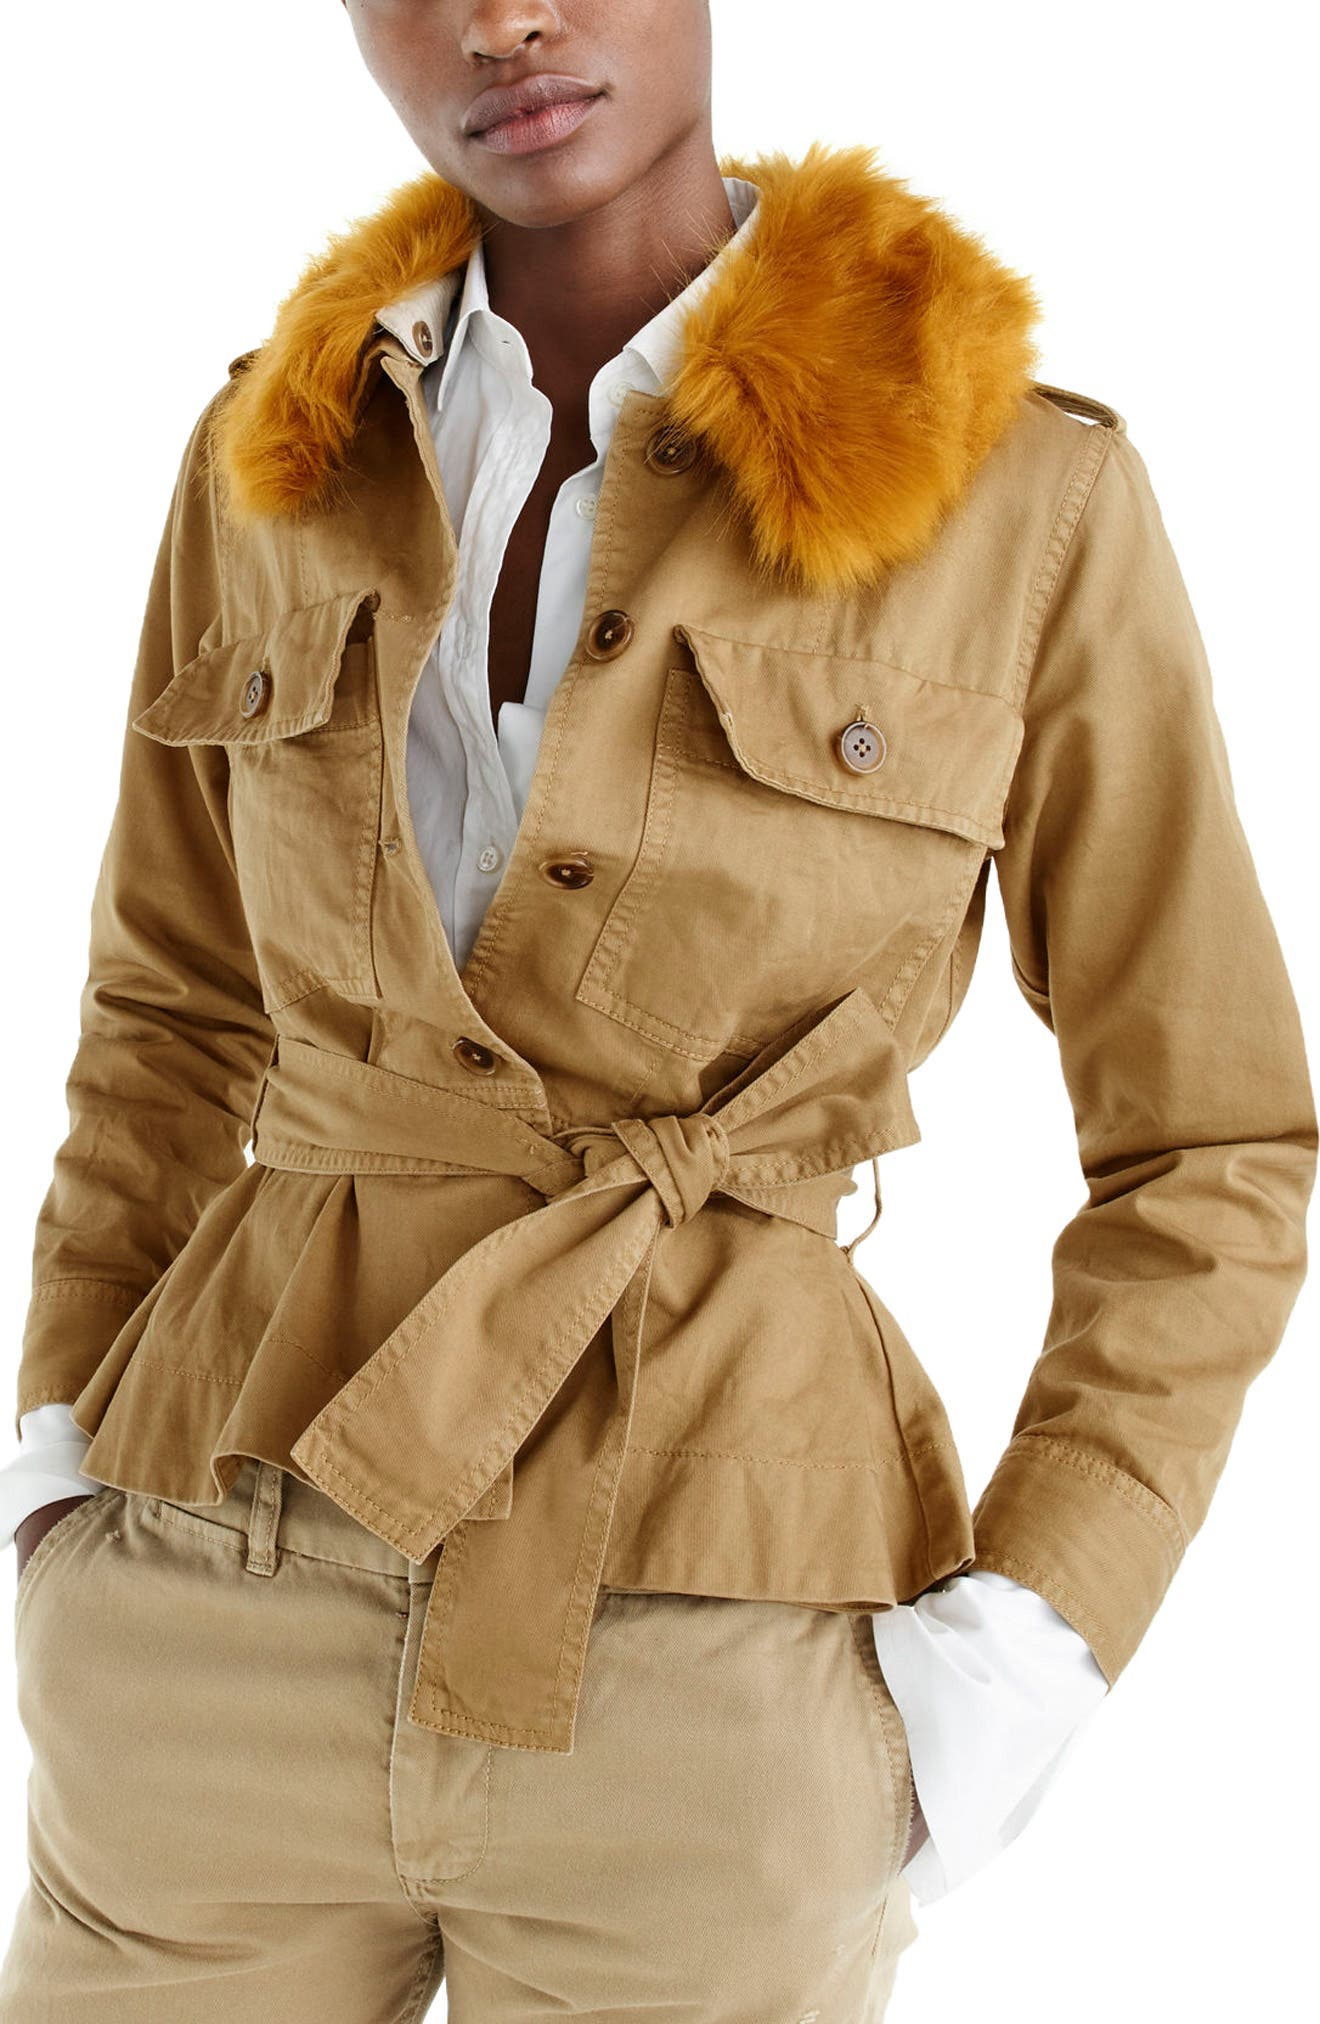 Alternate Image 1 Selected - J.Crew Peplum Chino Faux Fur Collar Jacket